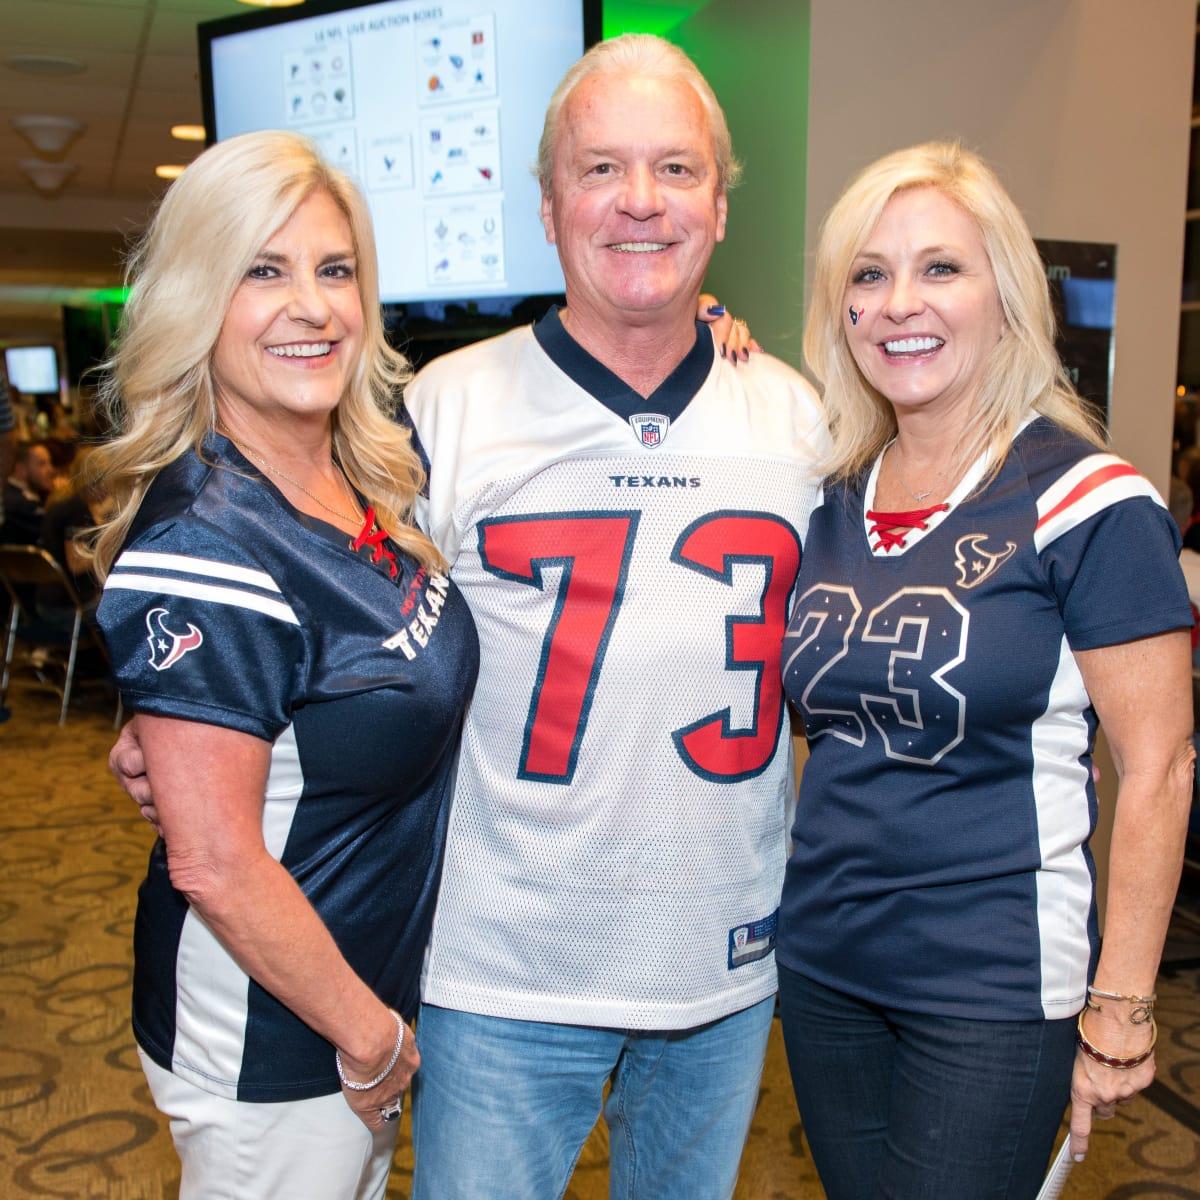 Fantasy Football draft 2015 Vicki and Bill Lehner, Karen DeGeurin